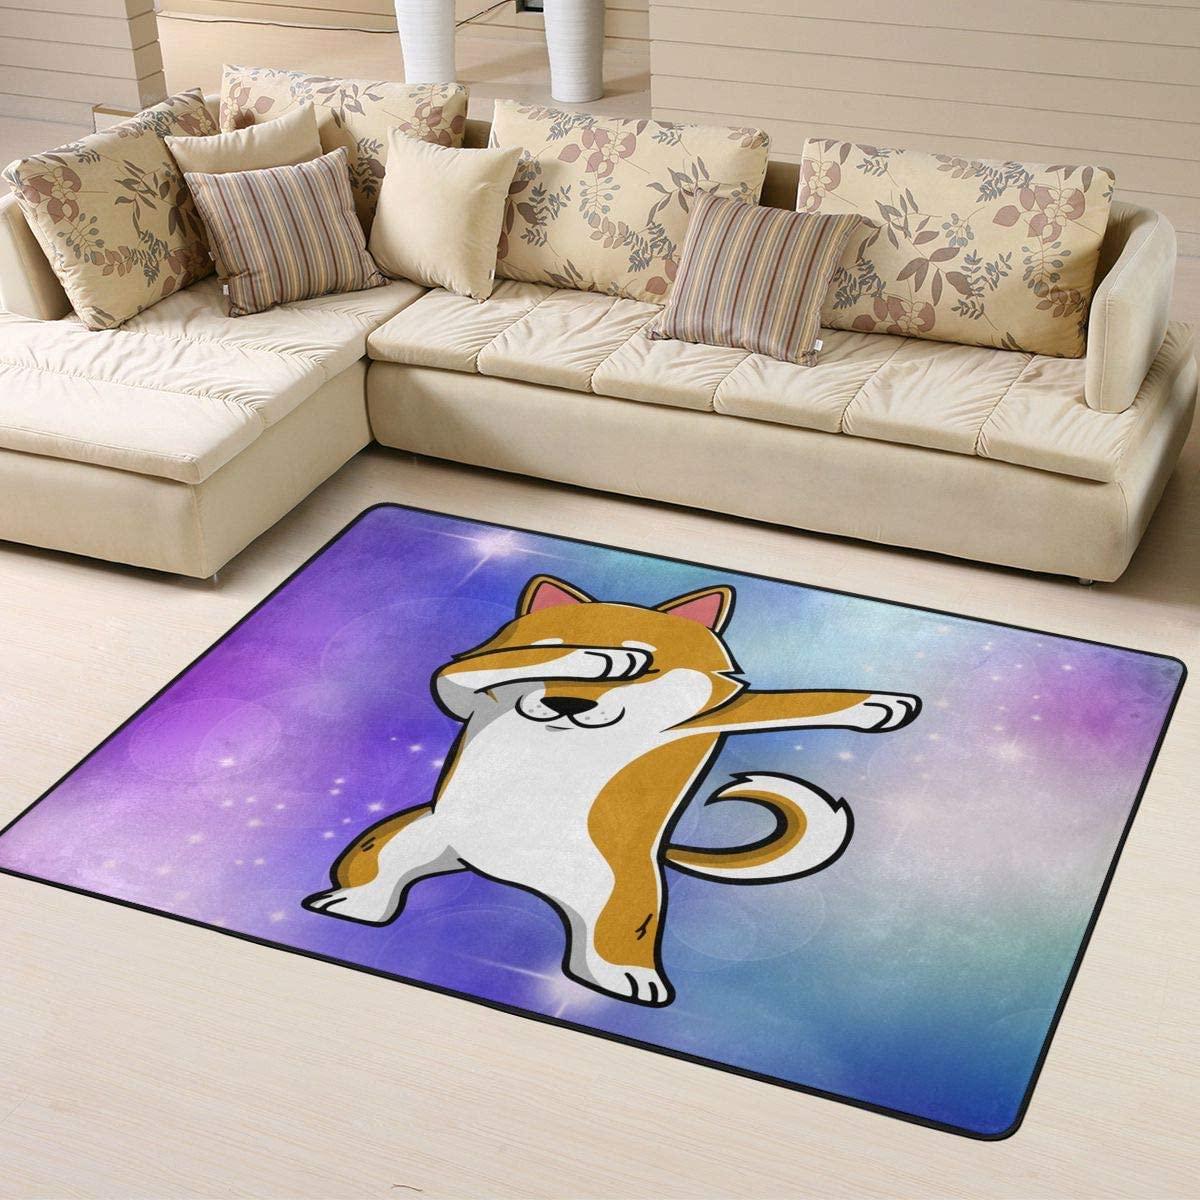 Swag Shiba Inu Area Rug Pad Solid Home Decorator Floor Mat Non-Slip Carpet 63 X 48 Inch